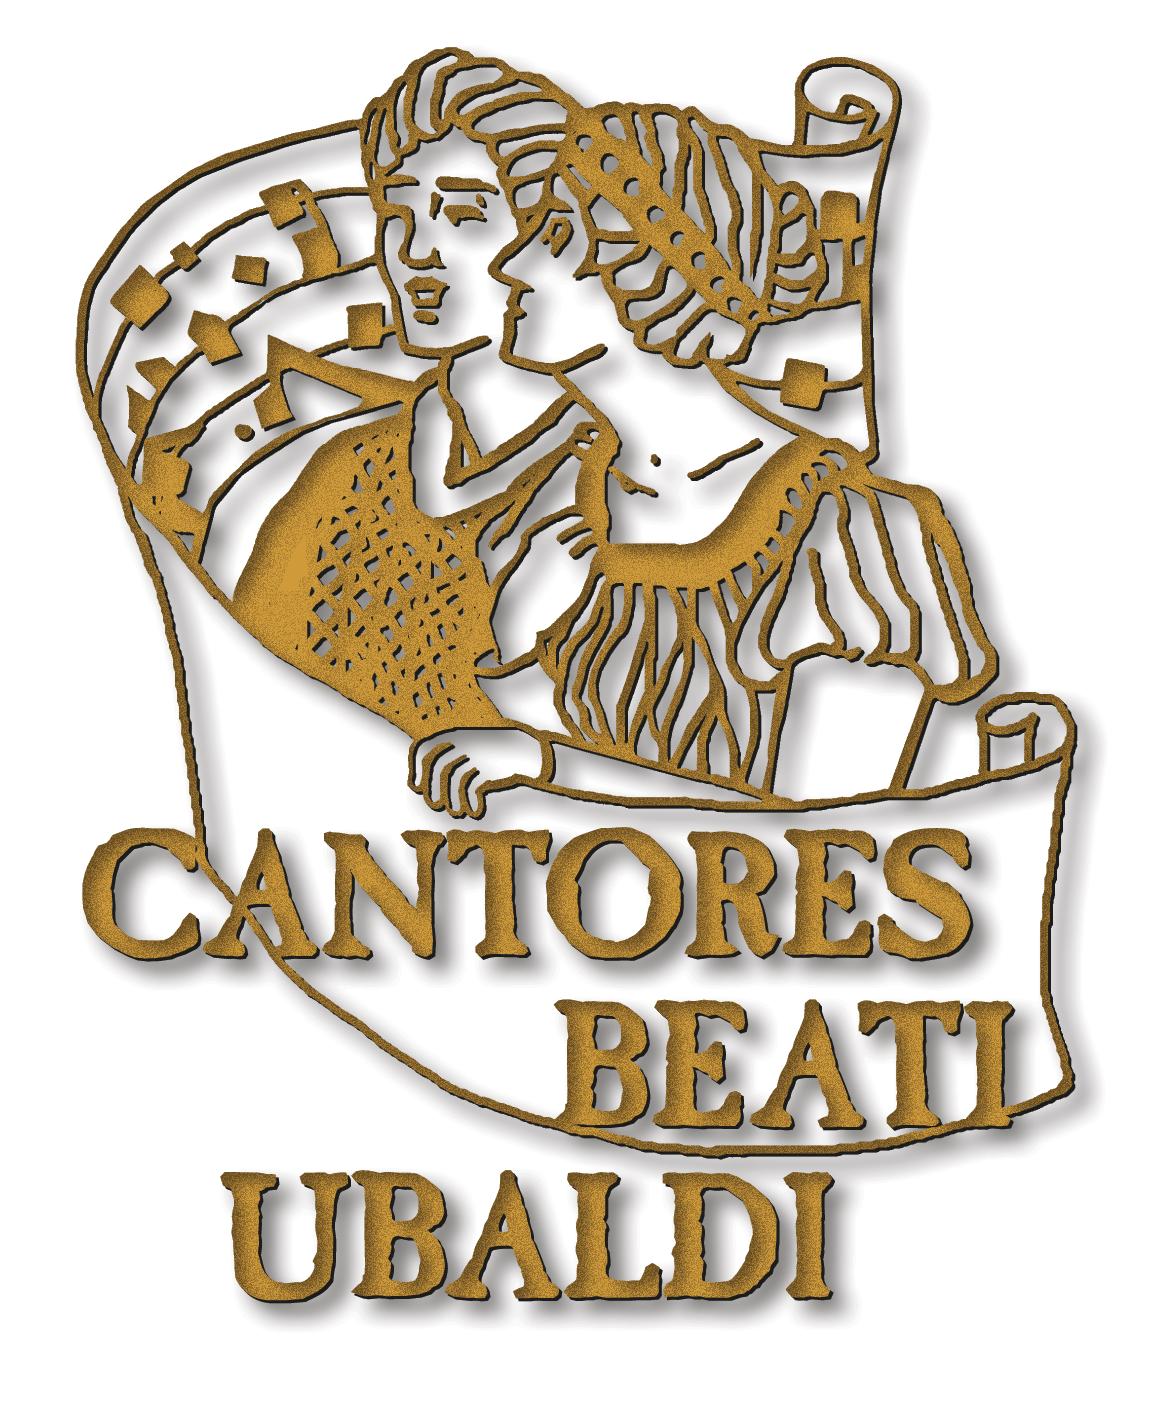 logo-cantores-beati-ubaldi.png